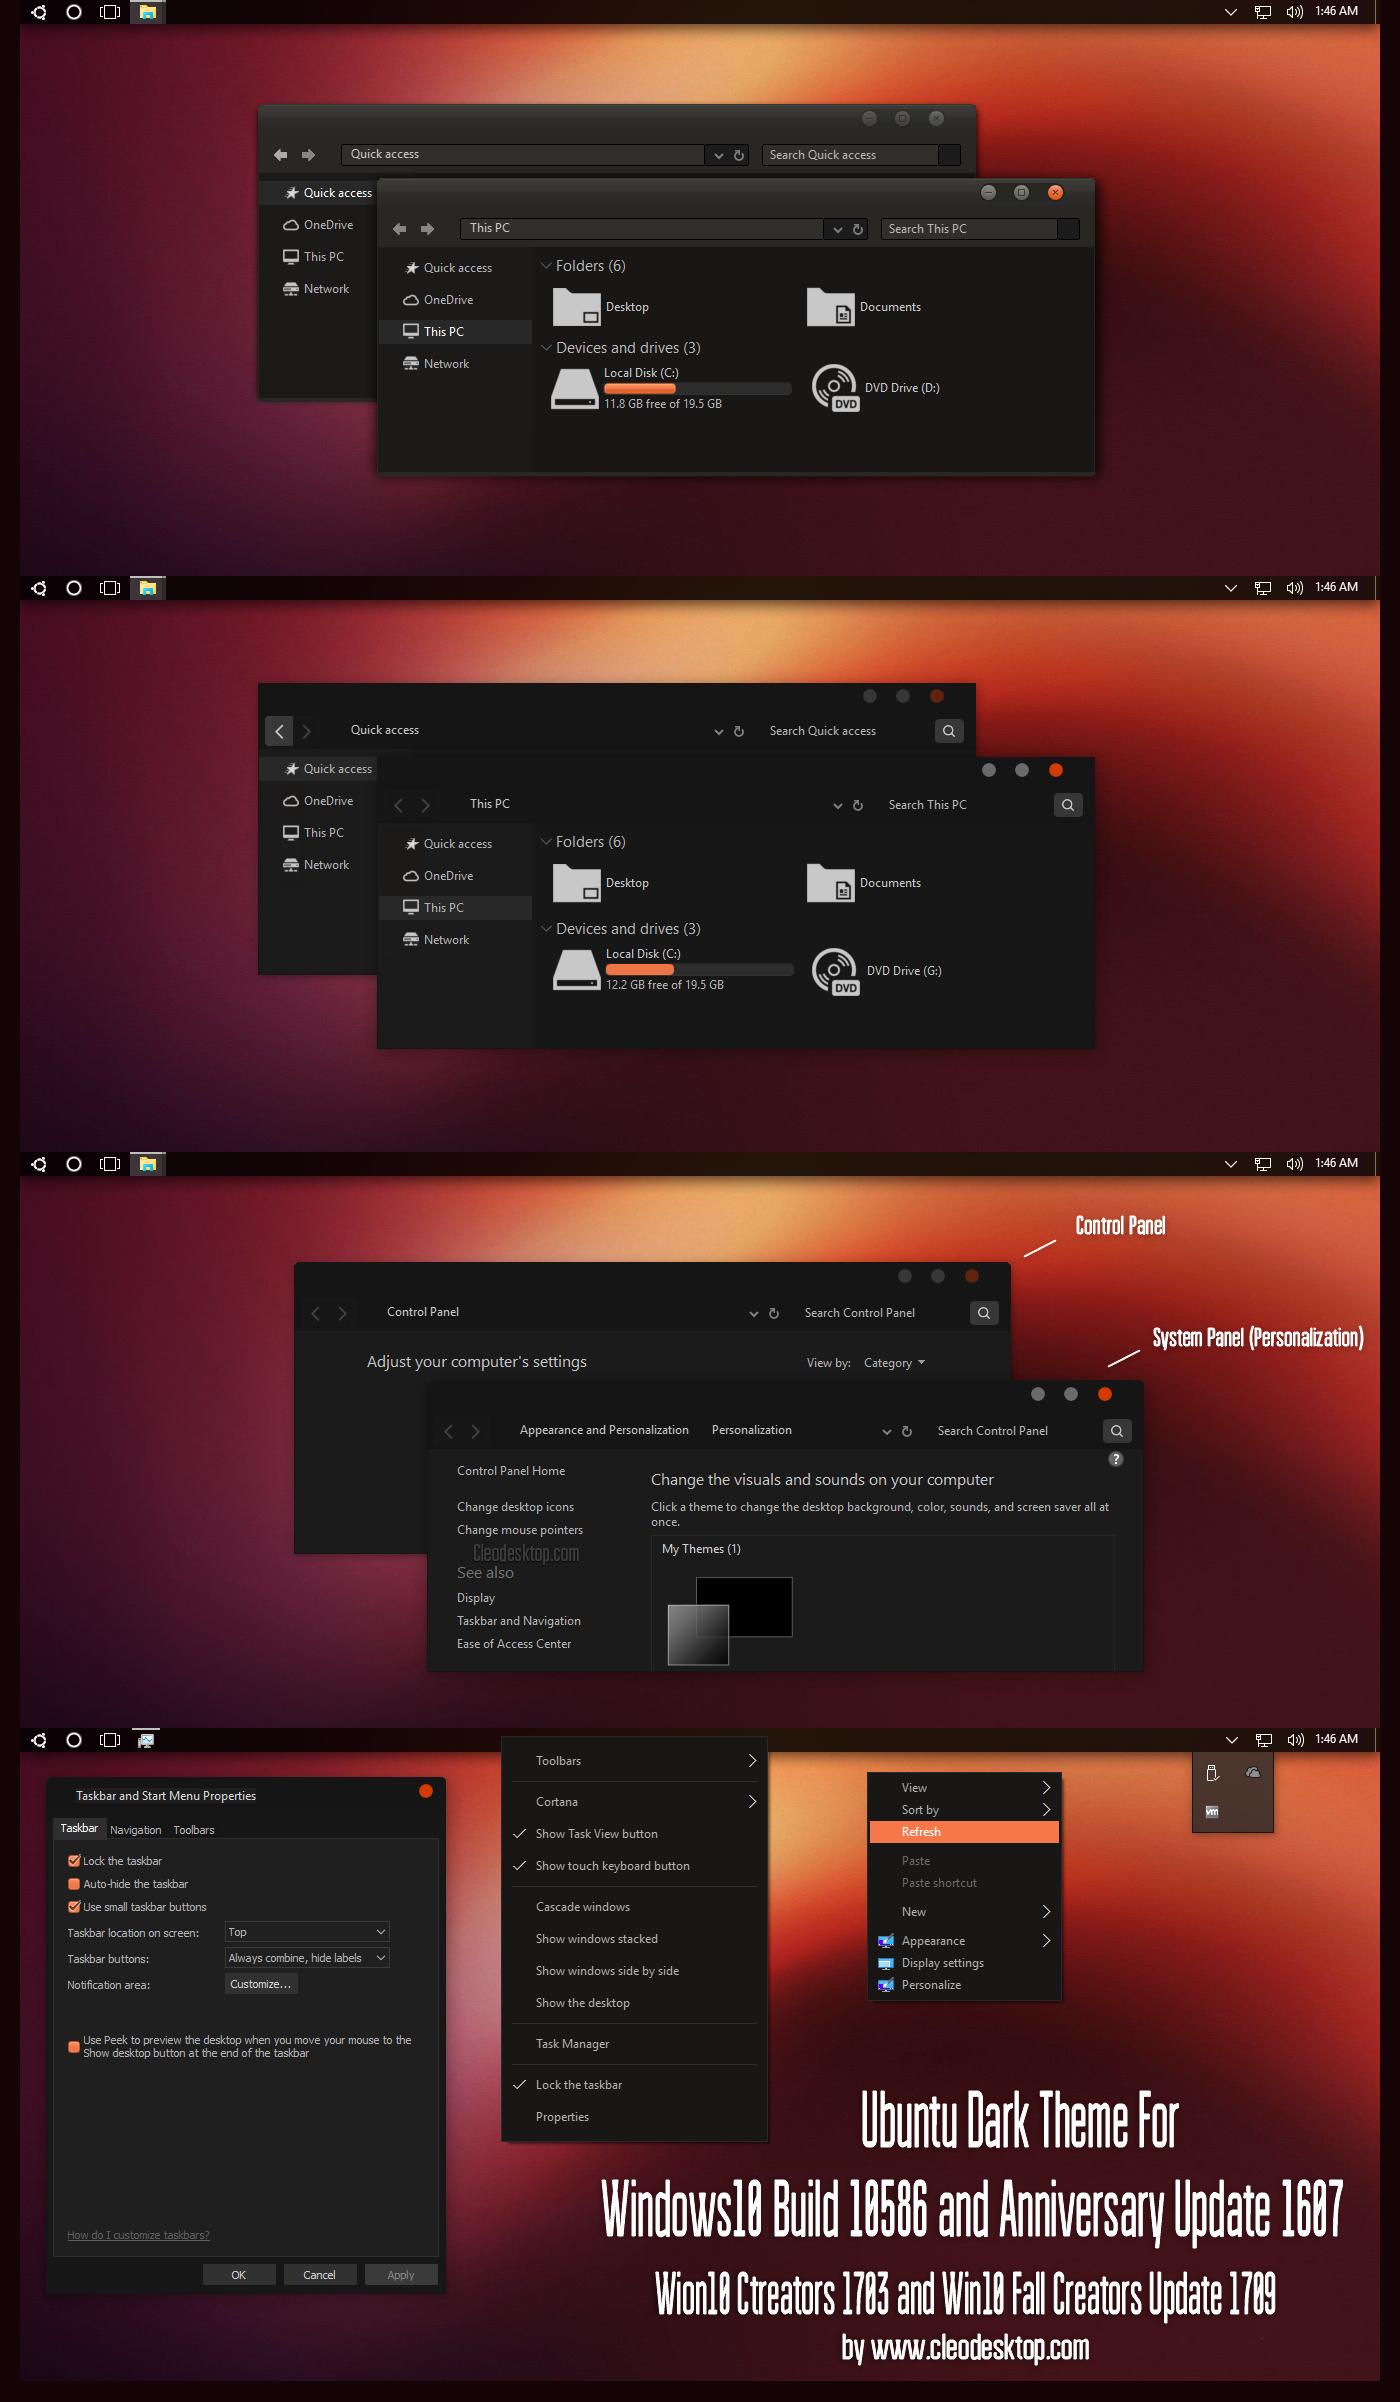 Ubuntu Dark Theme Win10 Fall Creators by Cleodesktop